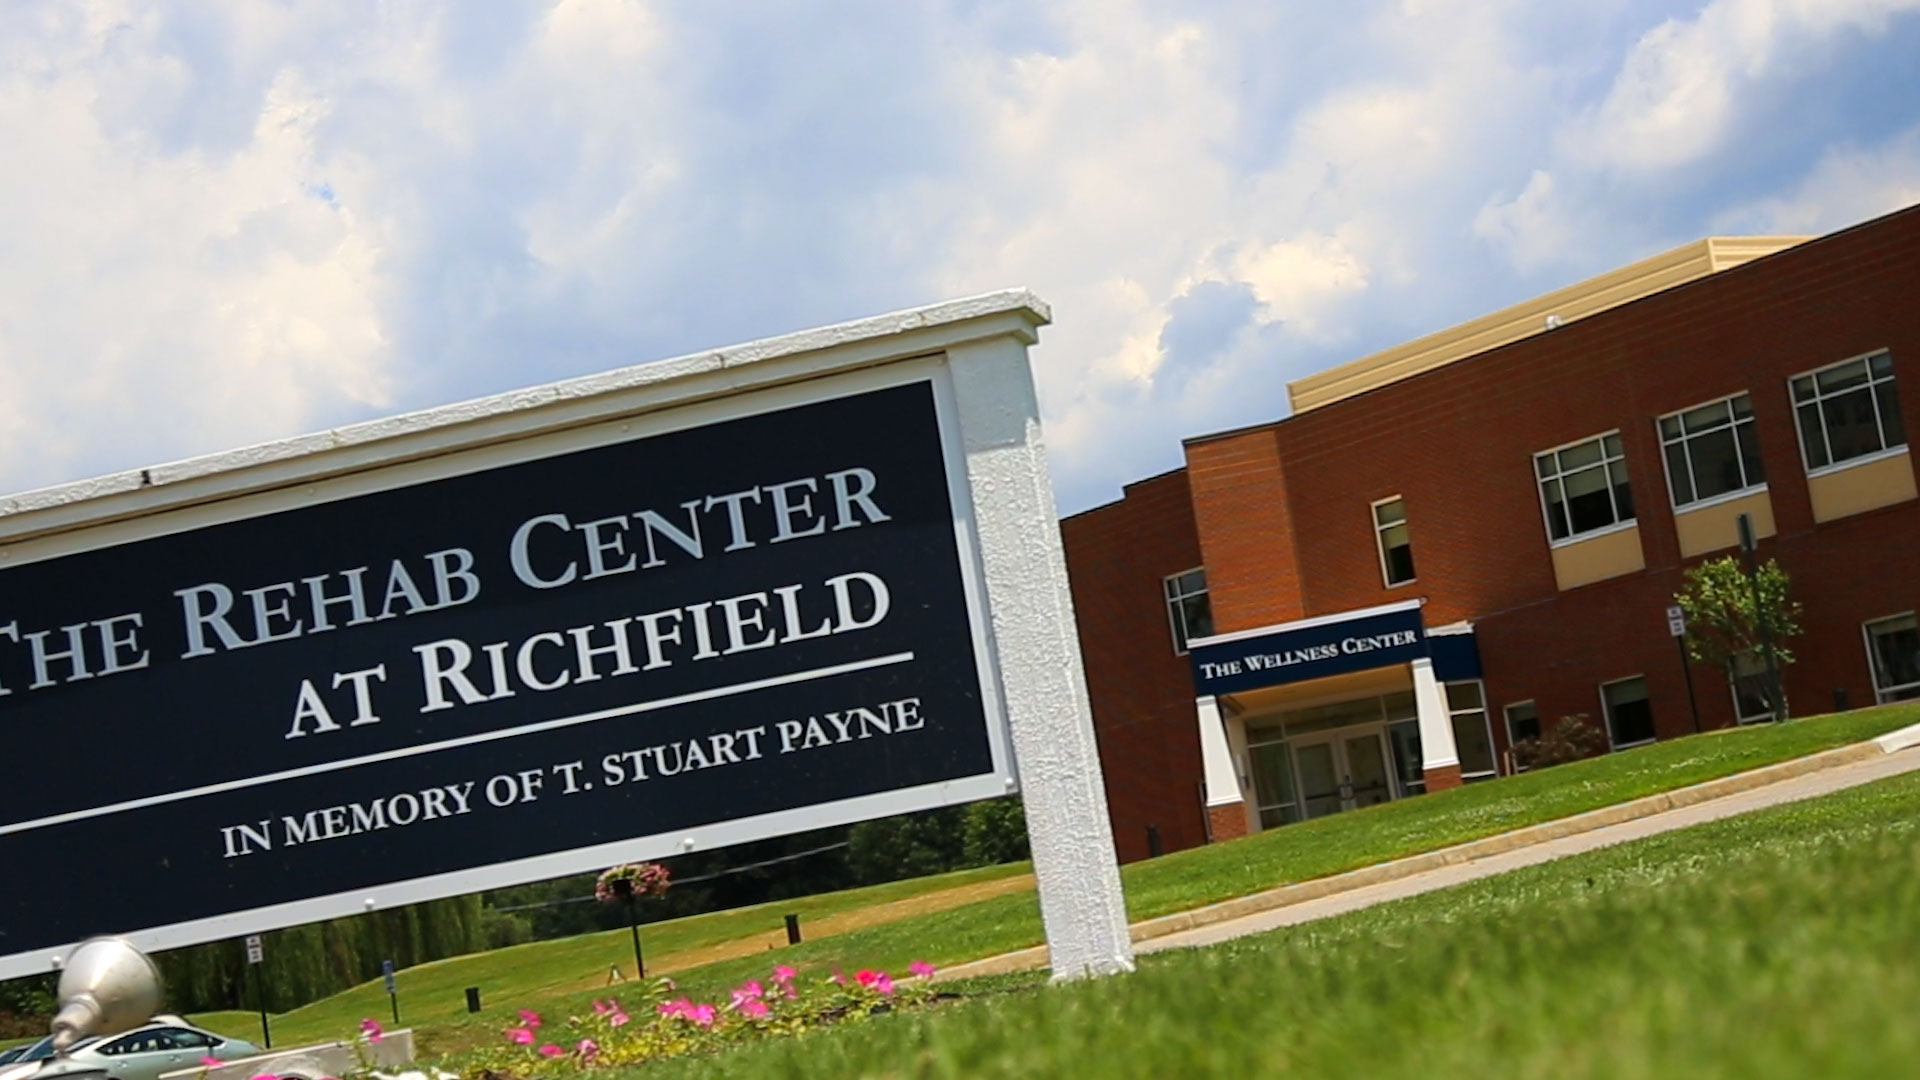 Rehab-Center-&-Wellness-Center-signs